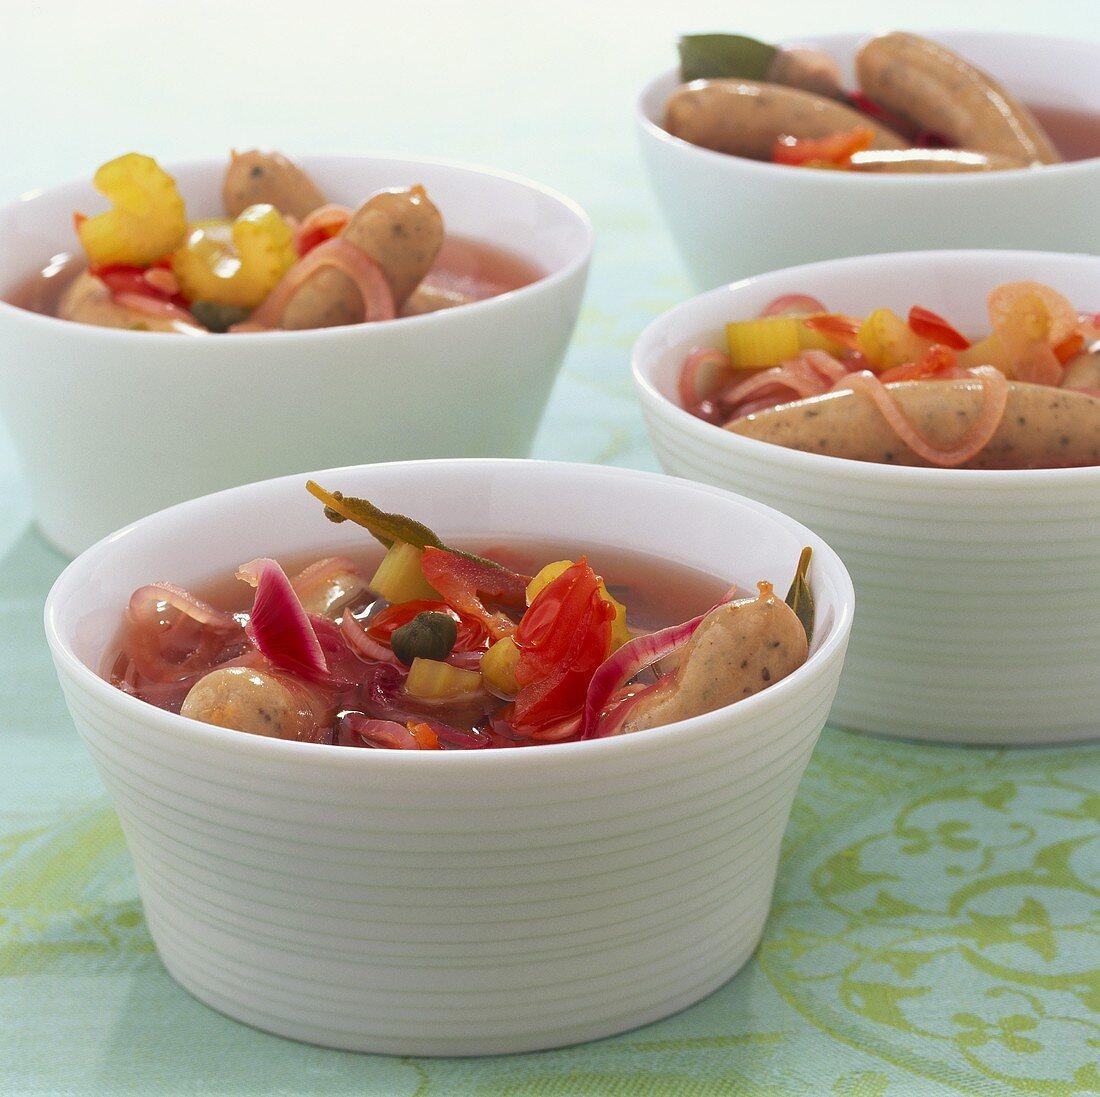 Saure Zipfel (Sausages cooked in vinegar)